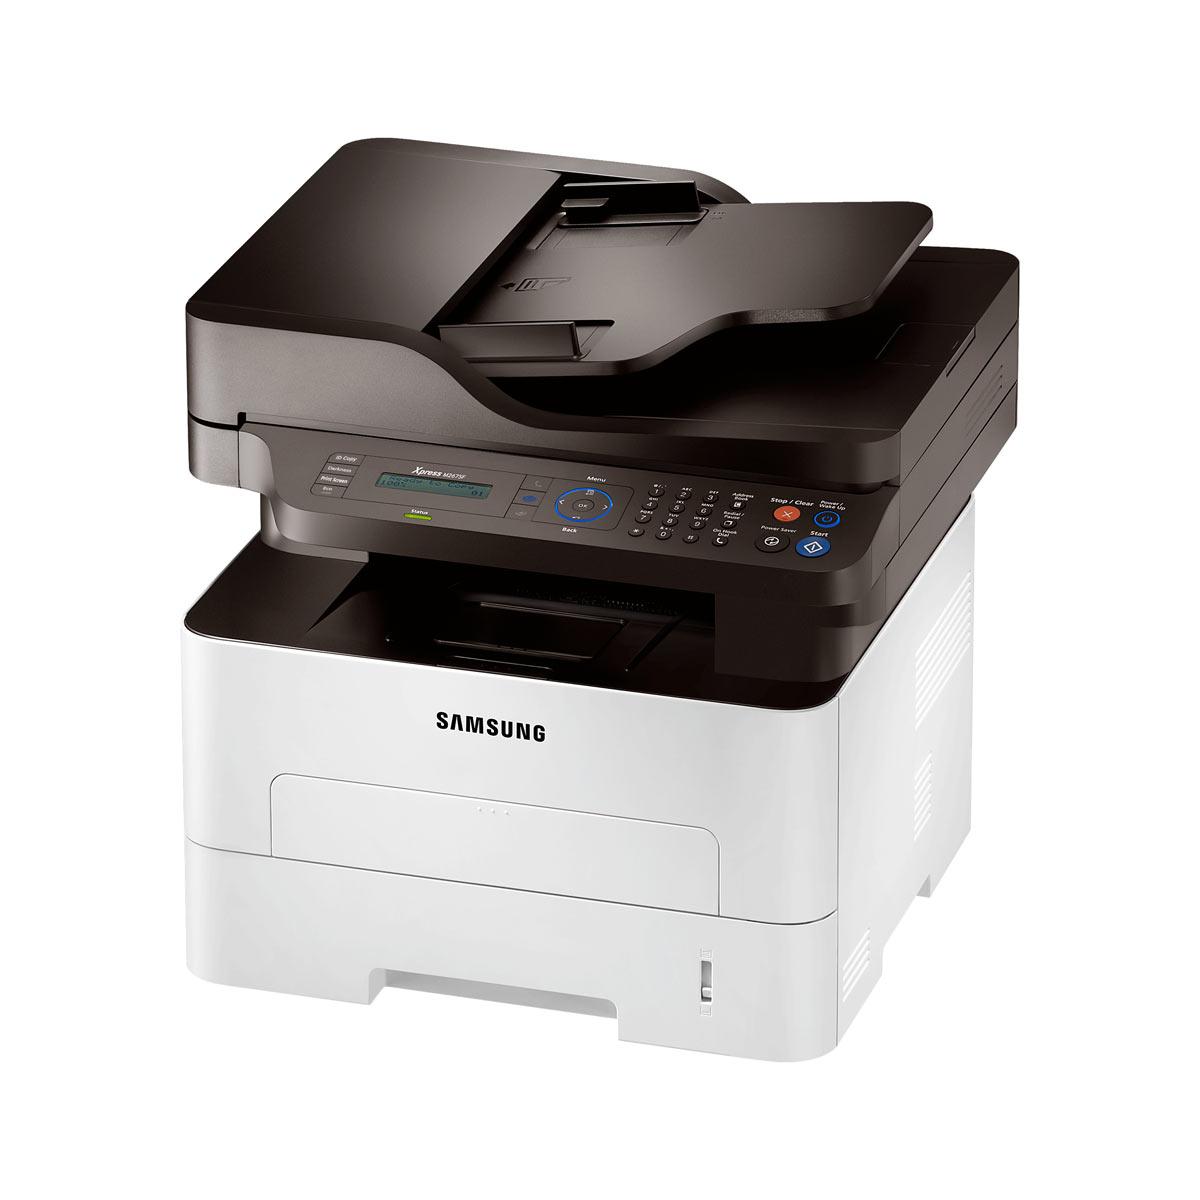 Samsung SL-M2675FN (Laser Mono./Fax/Reseau) (SL-M2675FN/SEE) - Achat / Vente Imprimante Multifonction sur Cybertek.fr - 1